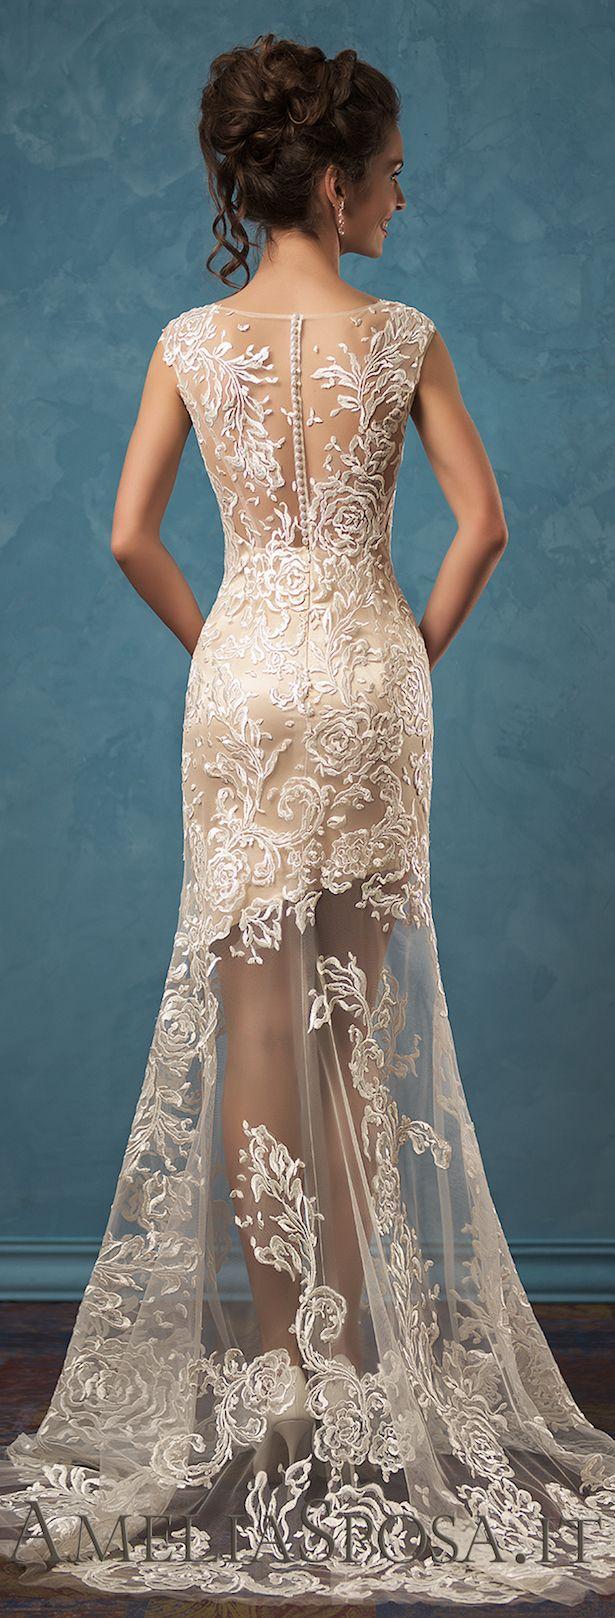 Cece wedding dress   best Wedding Dresses images on Pinterest  Bridal collection